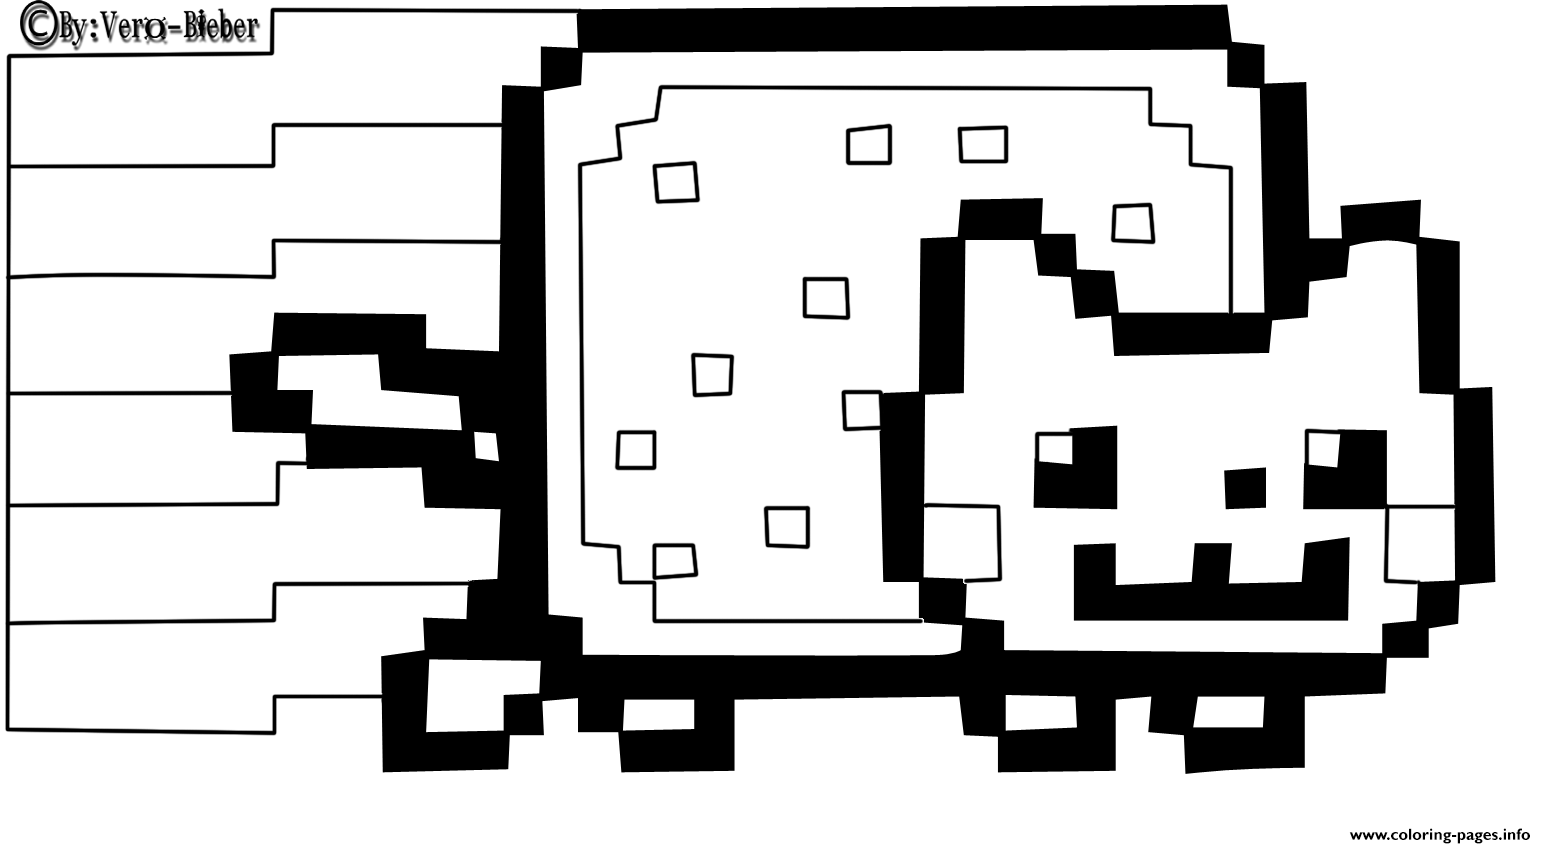 Print nyan cat by vero bieber coloring pages  Nyan cat, Cat